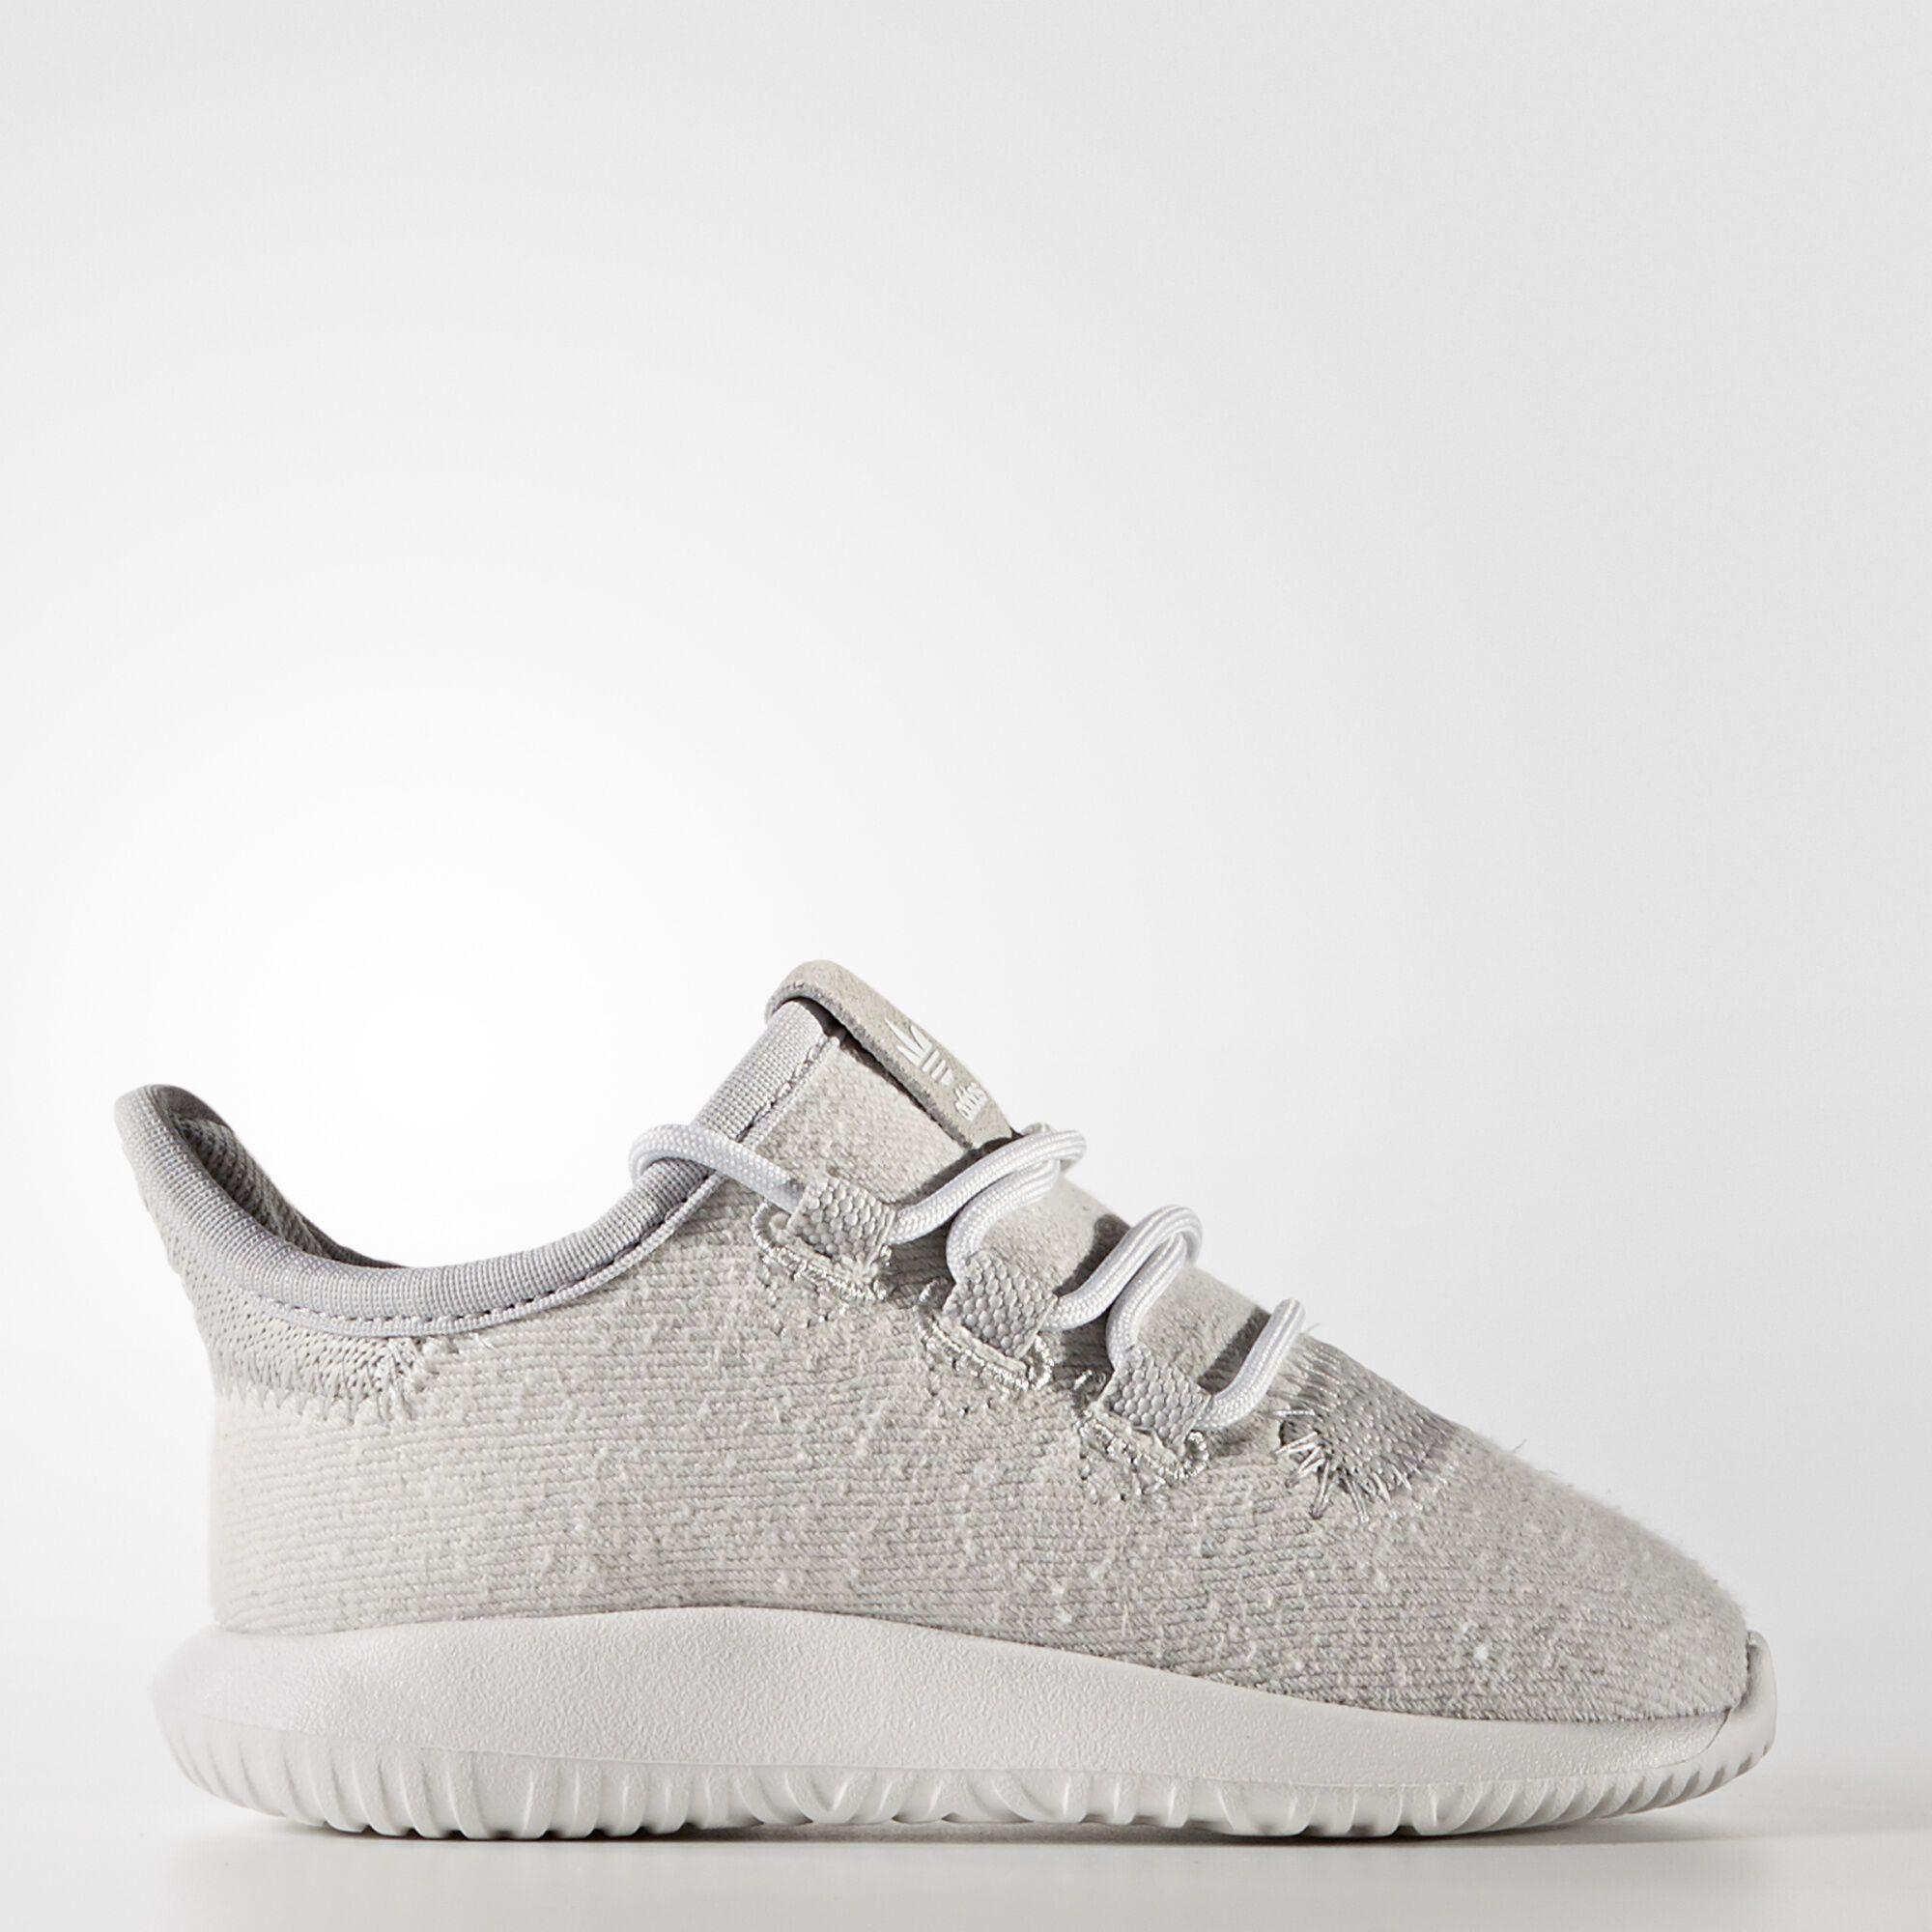 adidas Originals Tubular Doom Sneaker Urban Outfitters